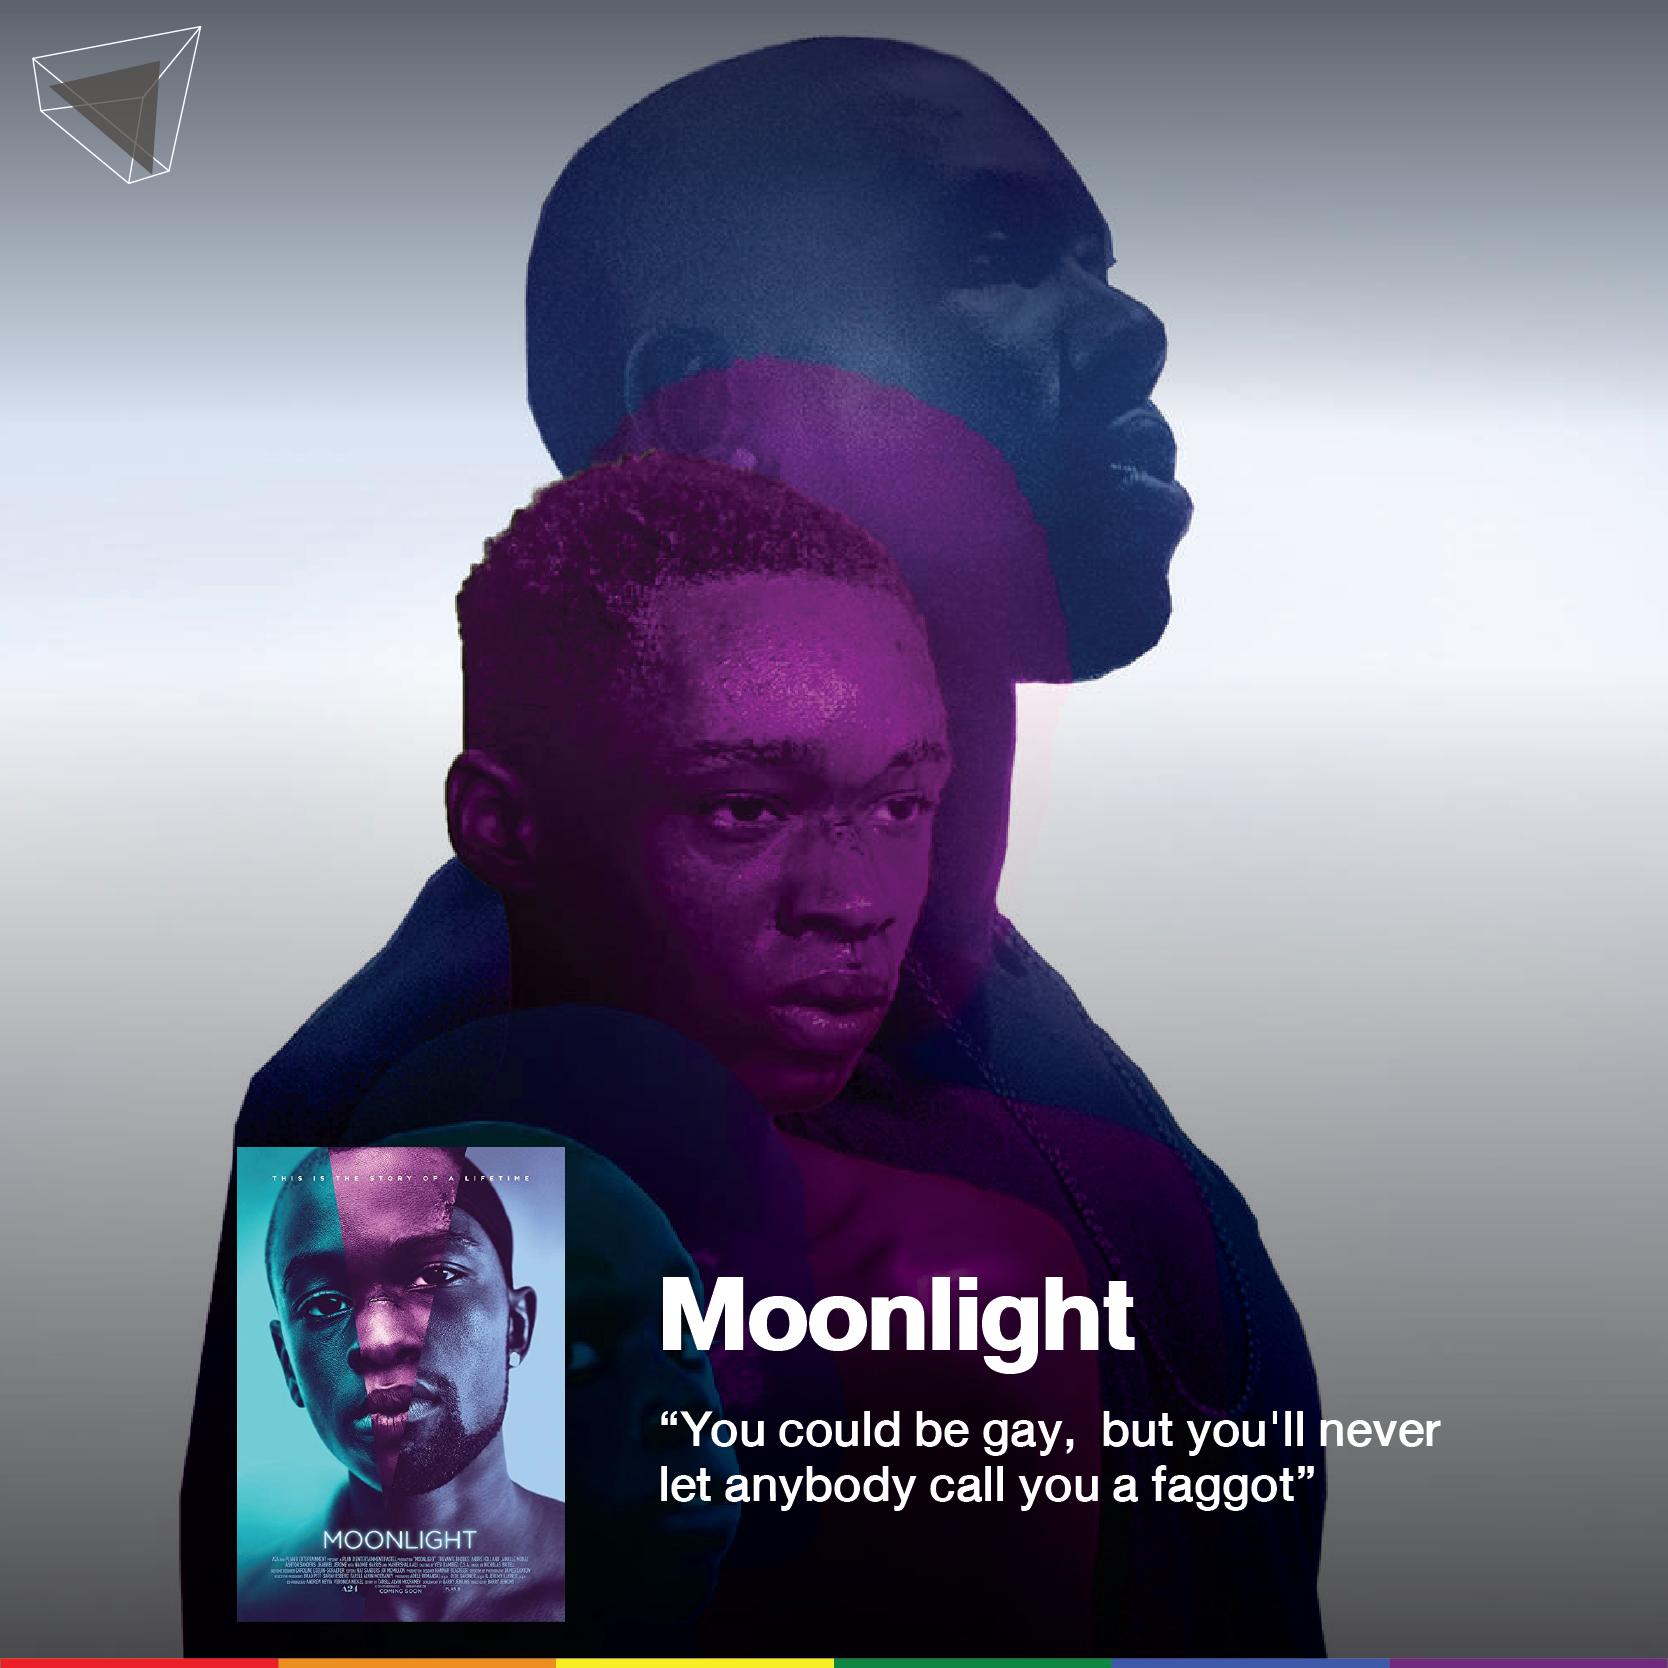 Moonlight (2016) หนังเกย์ผิวสี คว้ารางวัลออสการ์